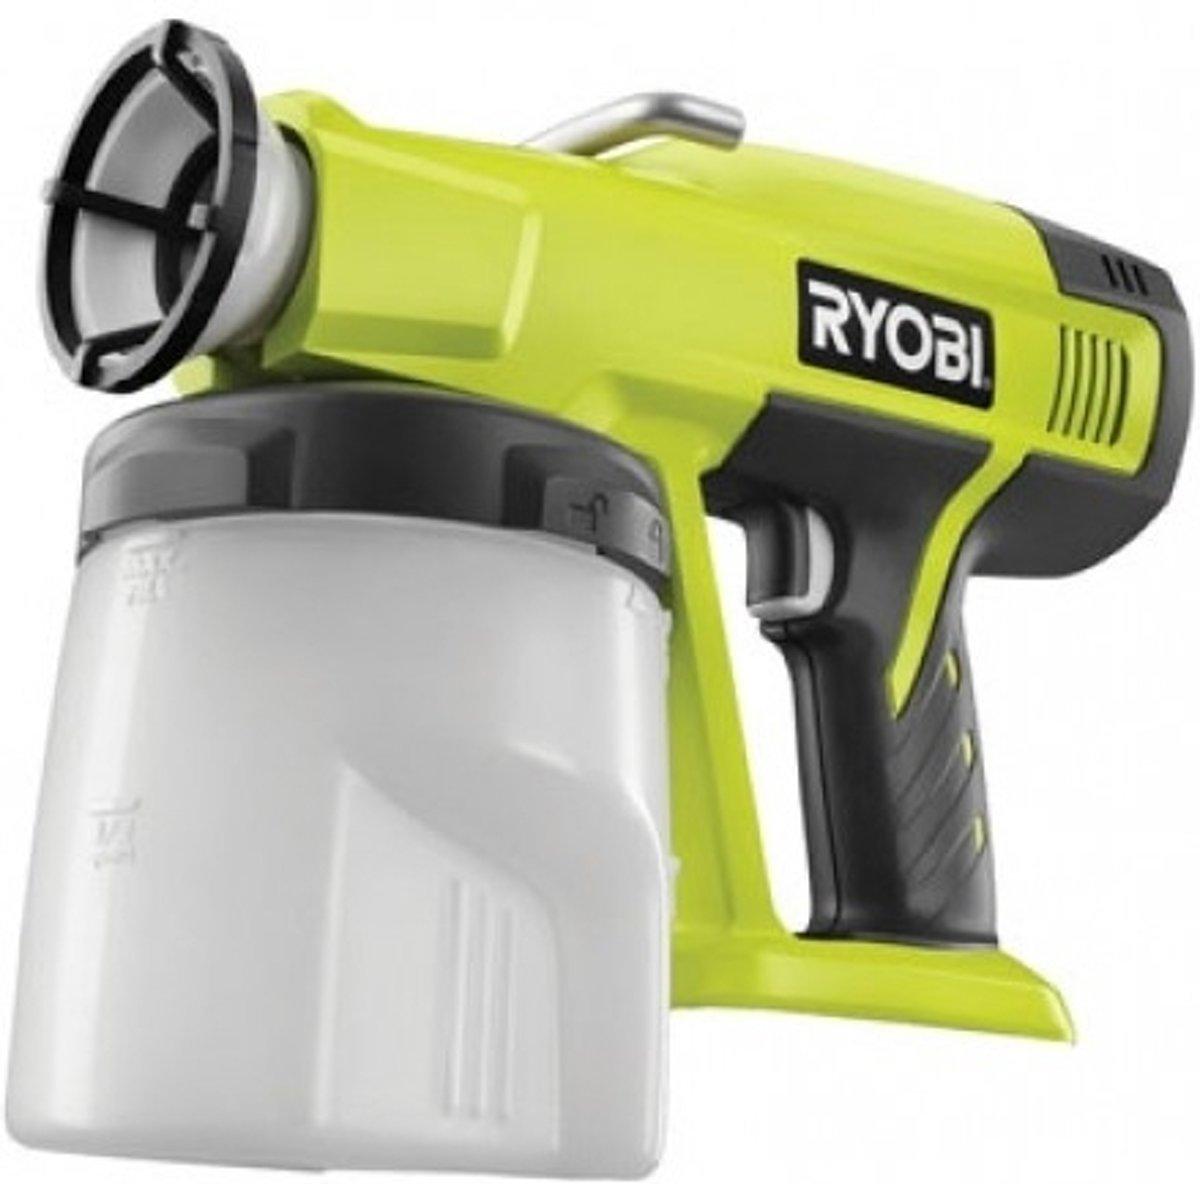 Ryobi P620 Accu-verfspuitpistool 18 V Debiet (max.) 333 ml/min